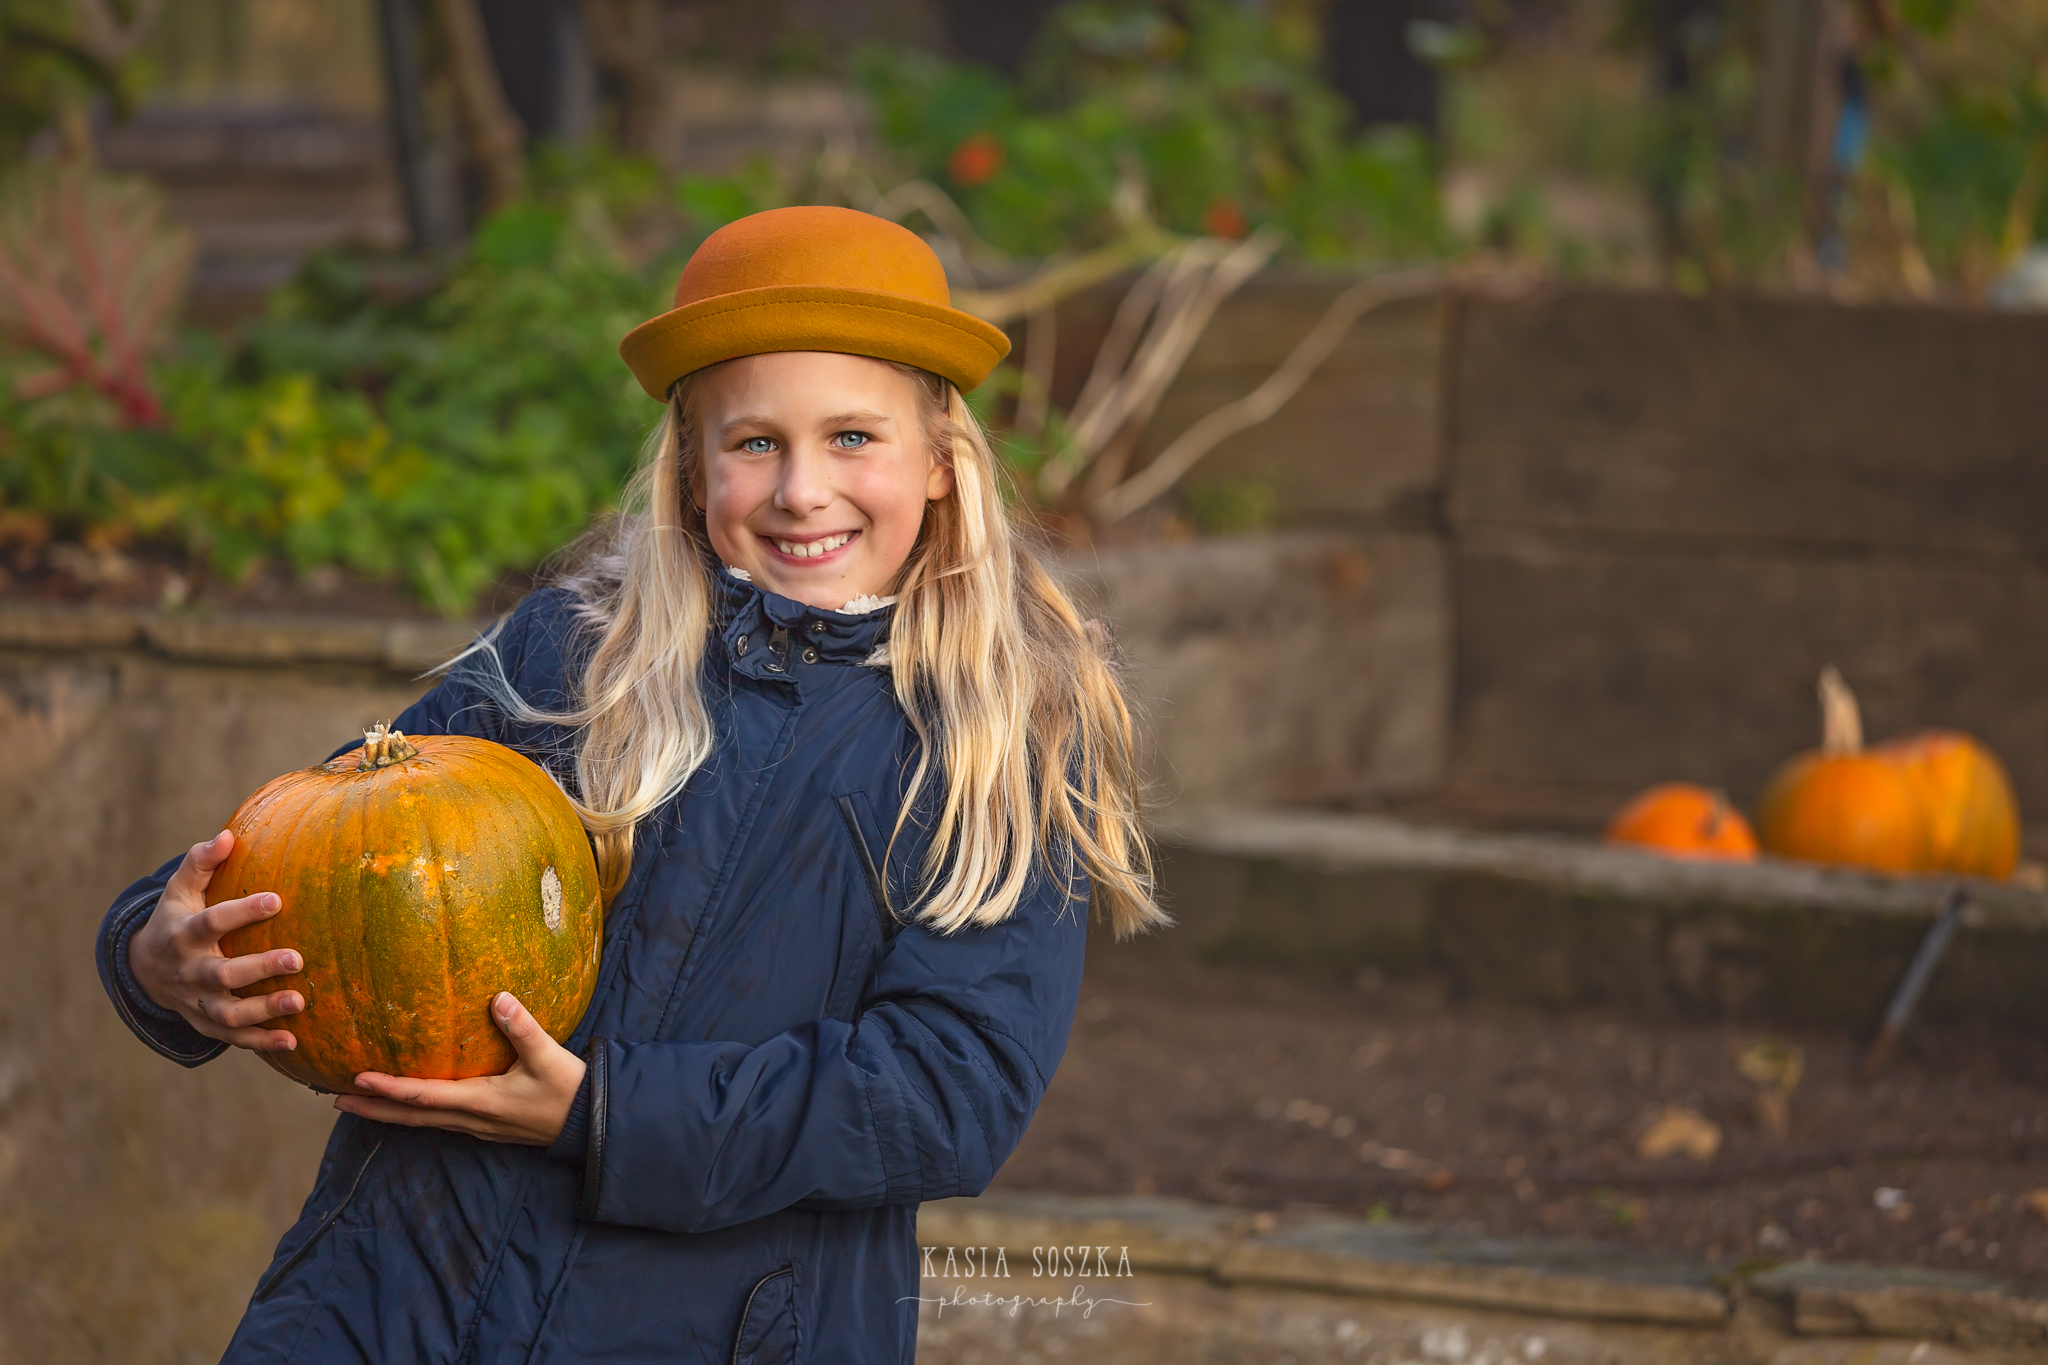 Children photography, child photographer Leeds, York, Bradford, Harrogate: pretty blond girl in a yellow hat holding a pumpkin